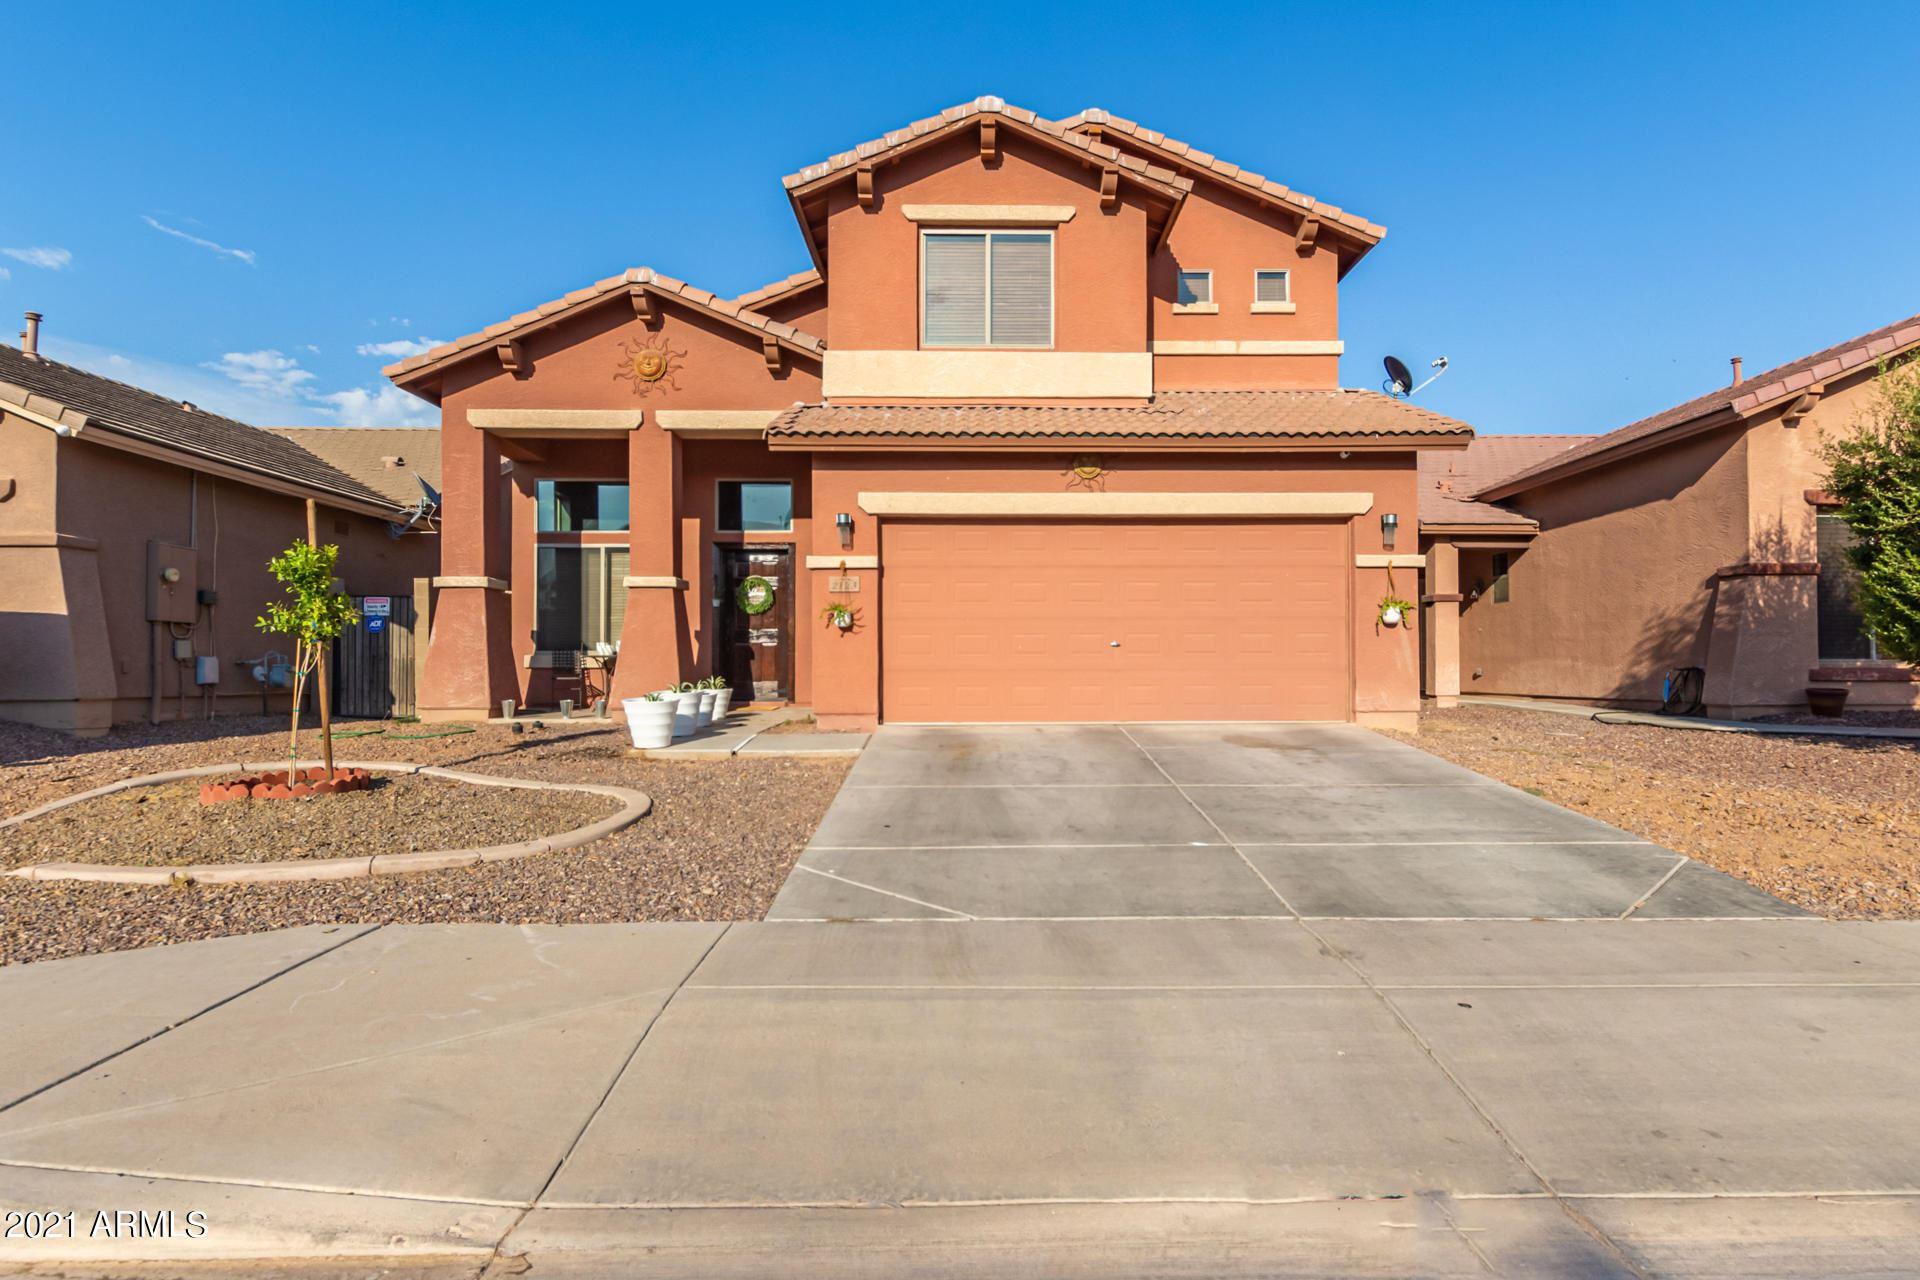 Photo of 2123 S 101ST Lane, Tolleson, AZ 85353 (MLS # 6262903)